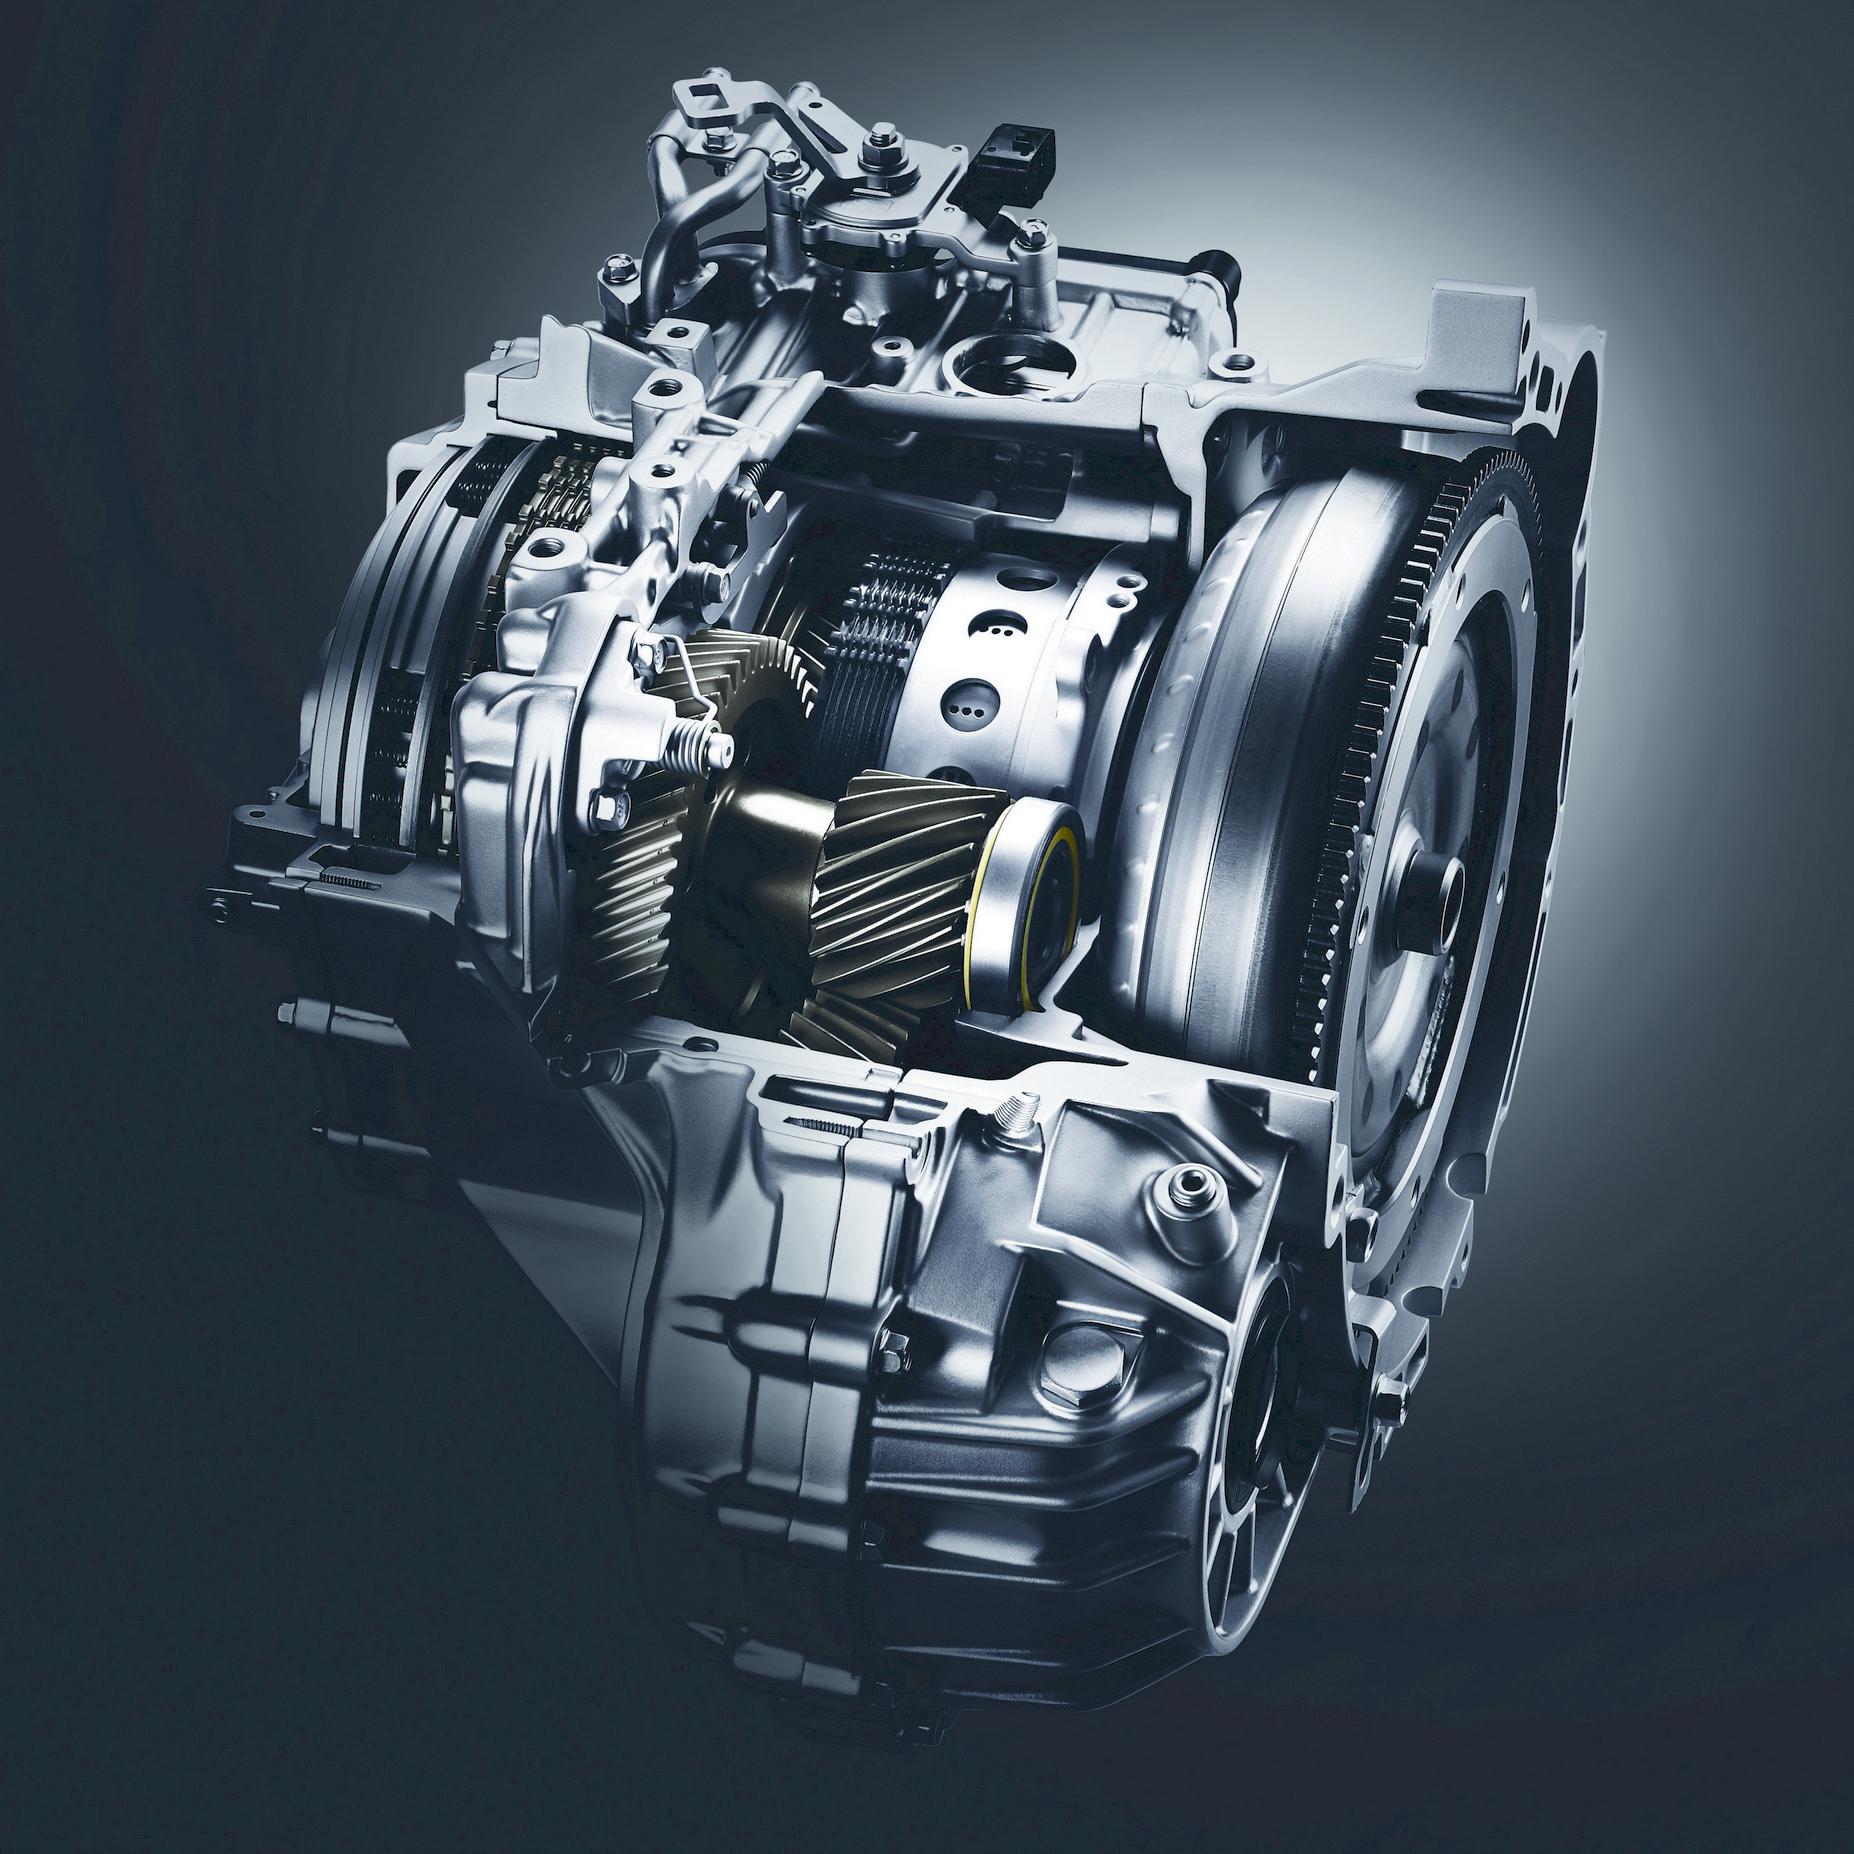 Kia details its new 8speed automatic transmission